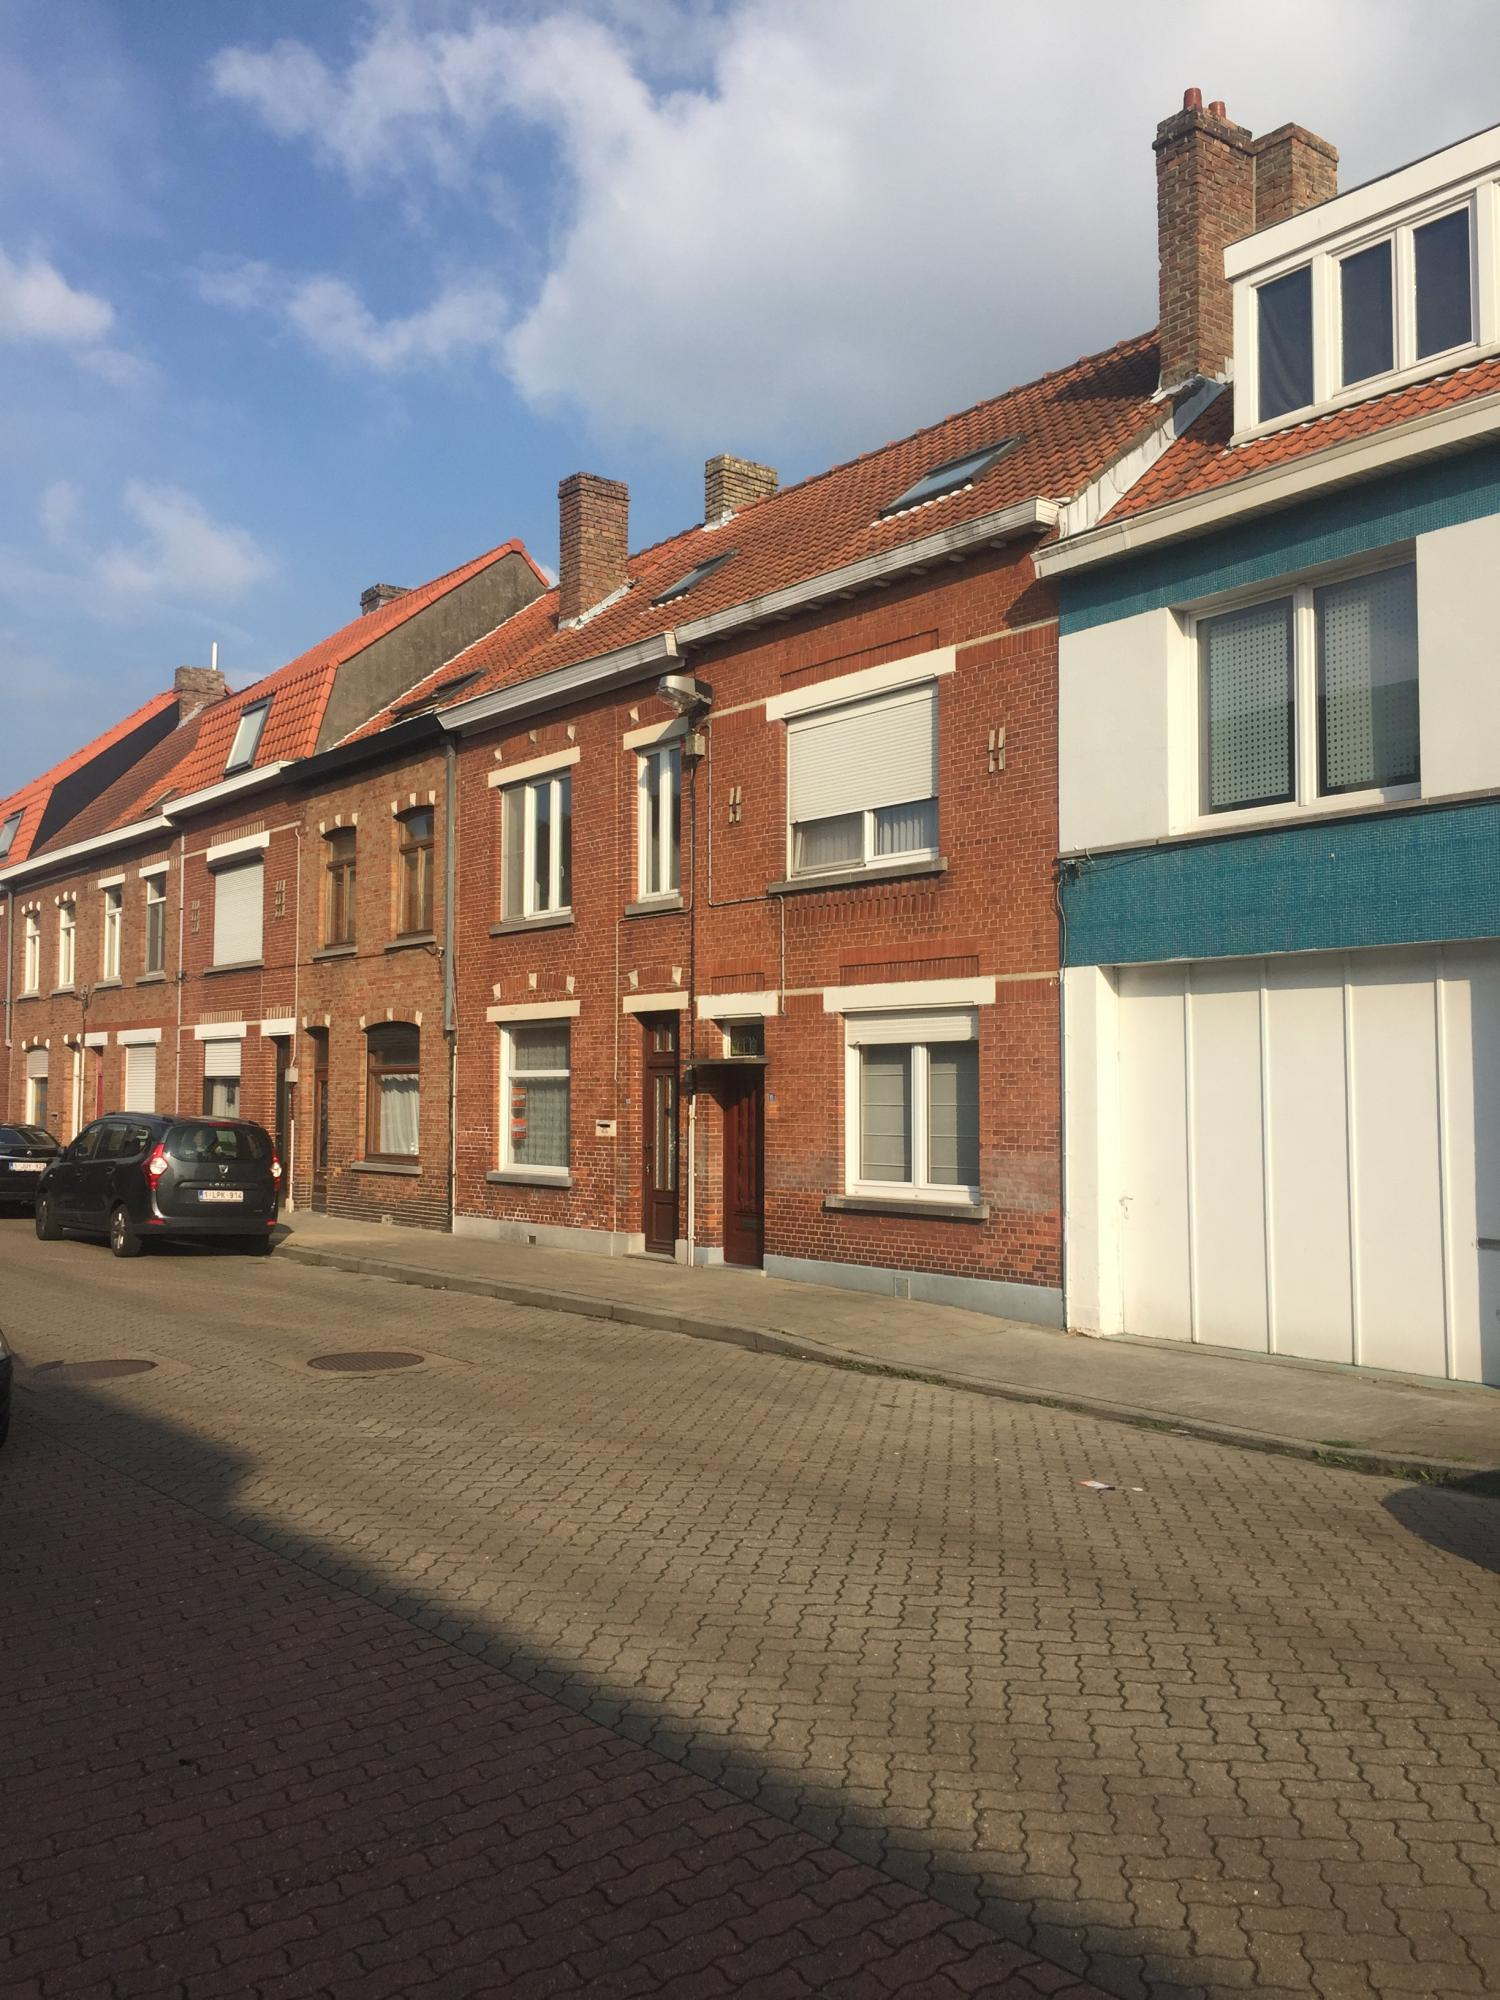 Huis met 2 slaapkamers te koop in Assebroek (8310) - Zimmo